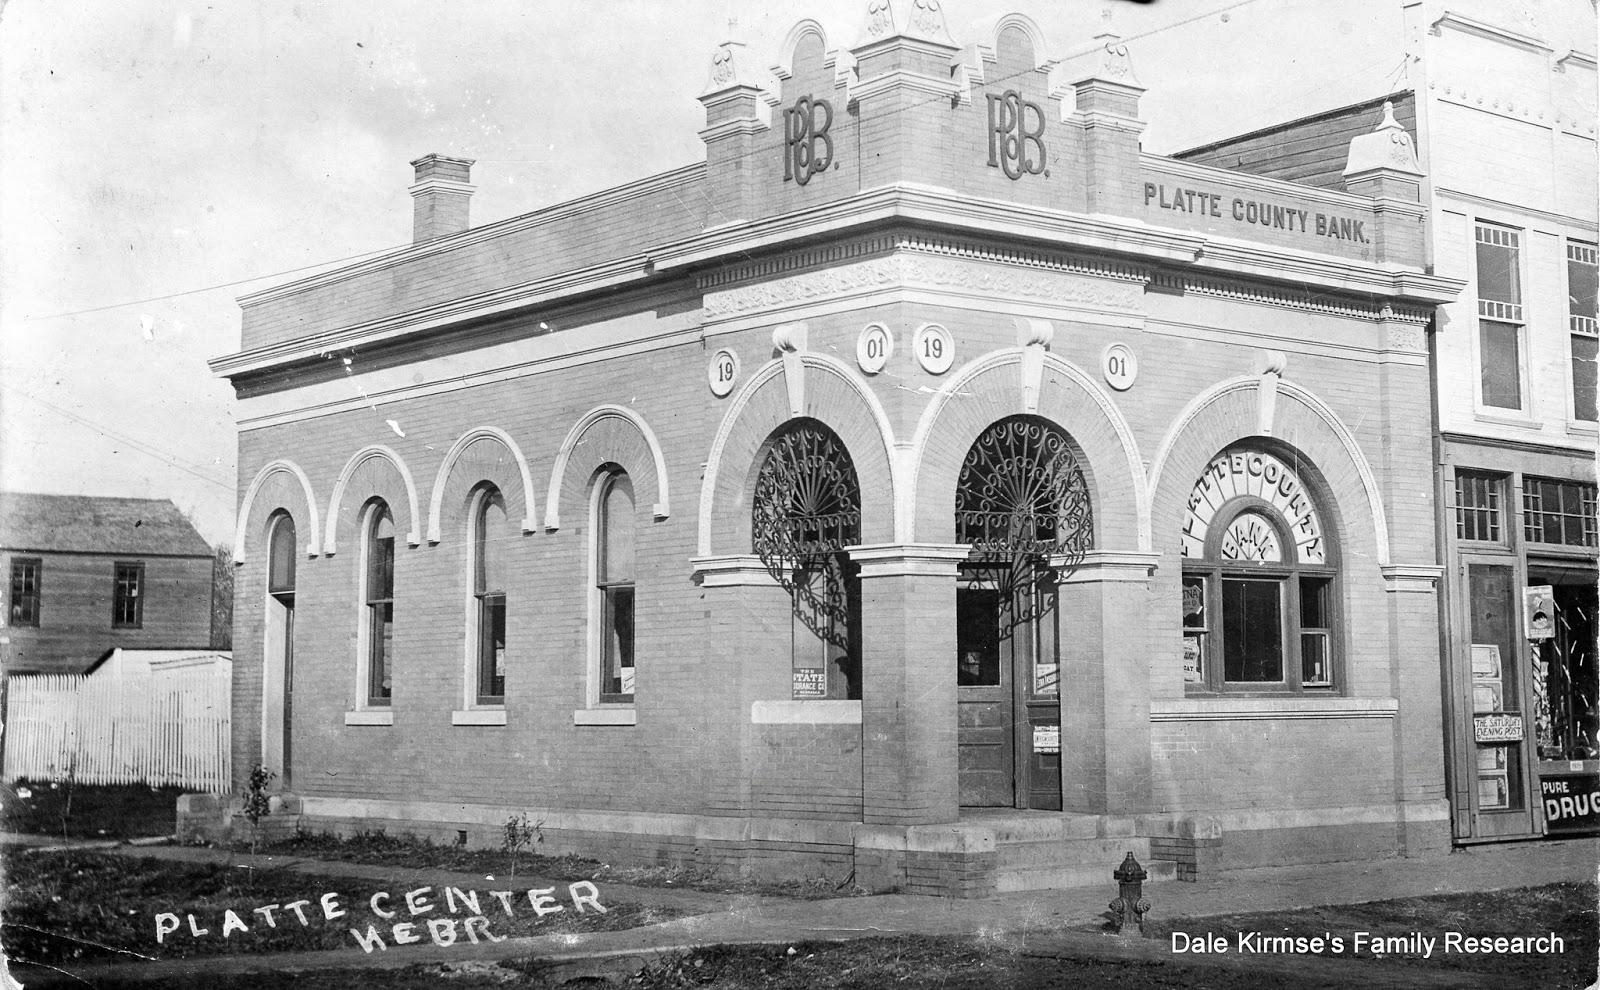 Platte County Bank